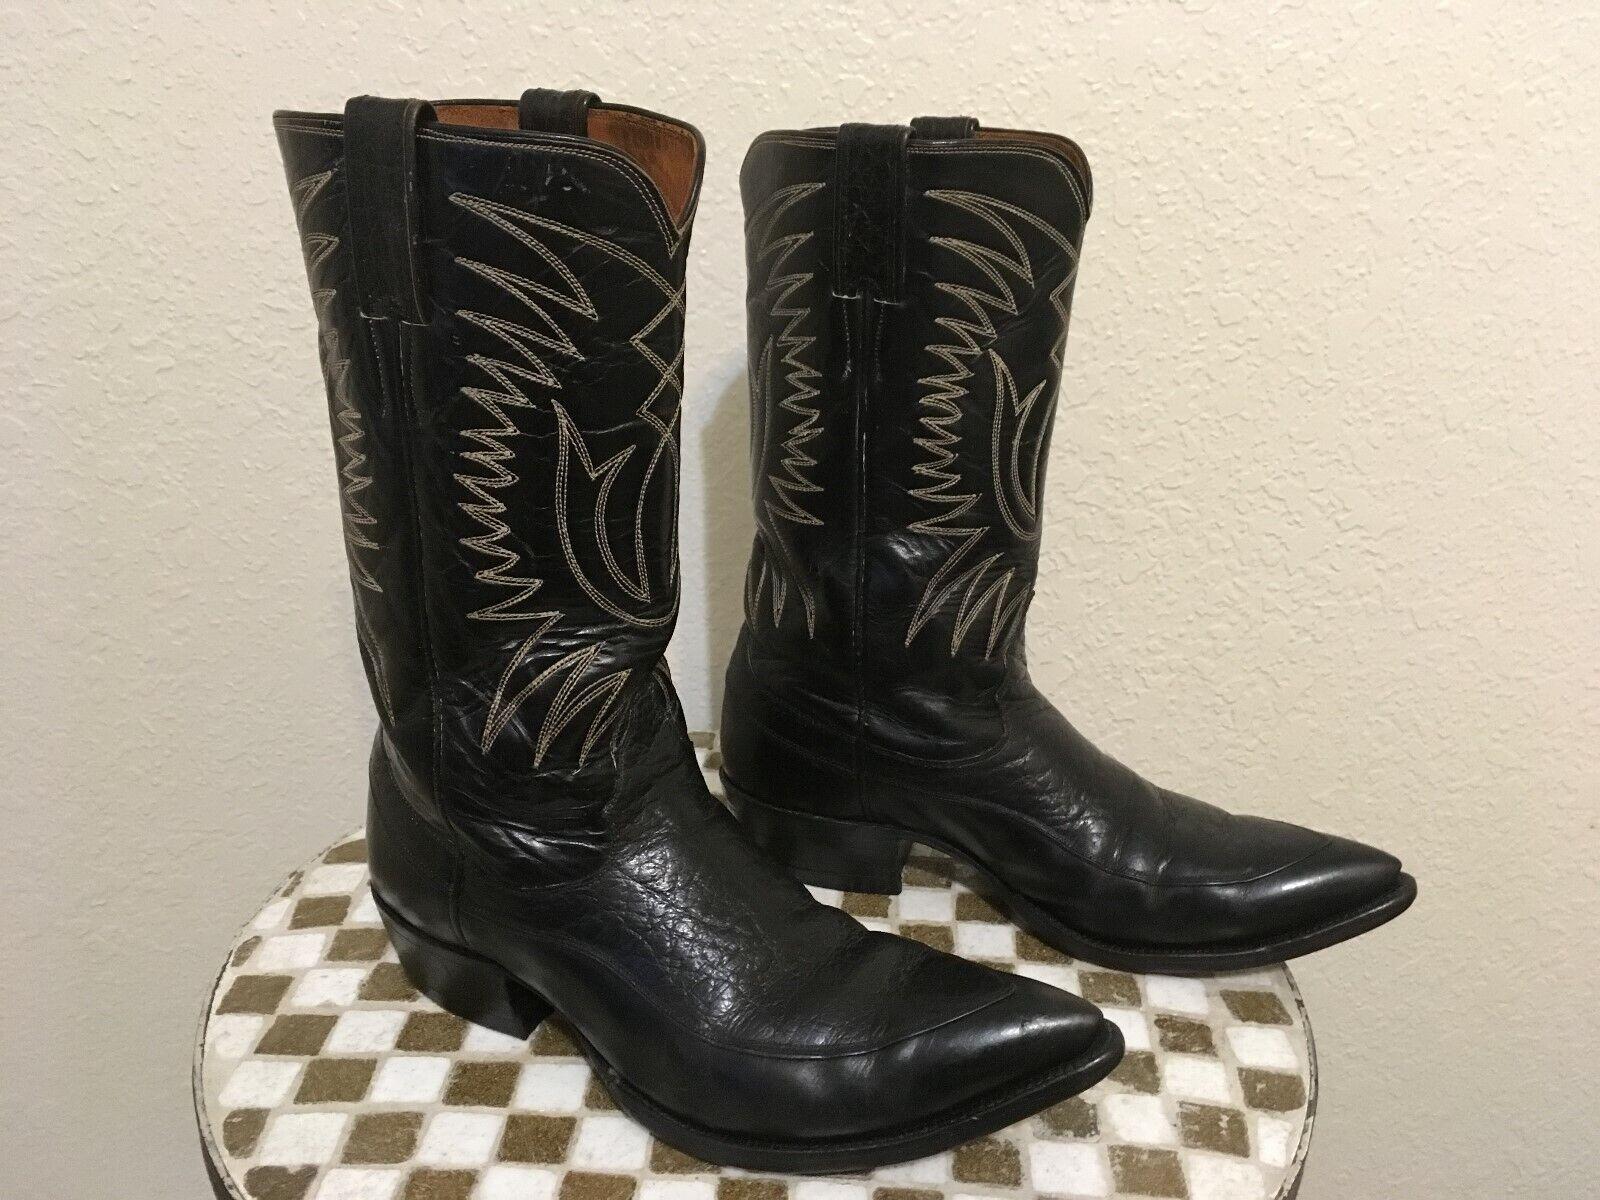 VINTAGE USA JUSTIN 2349 ROCKABILLY negro WESTERN COWBOY TRAIL BOSS botas 9.5 D